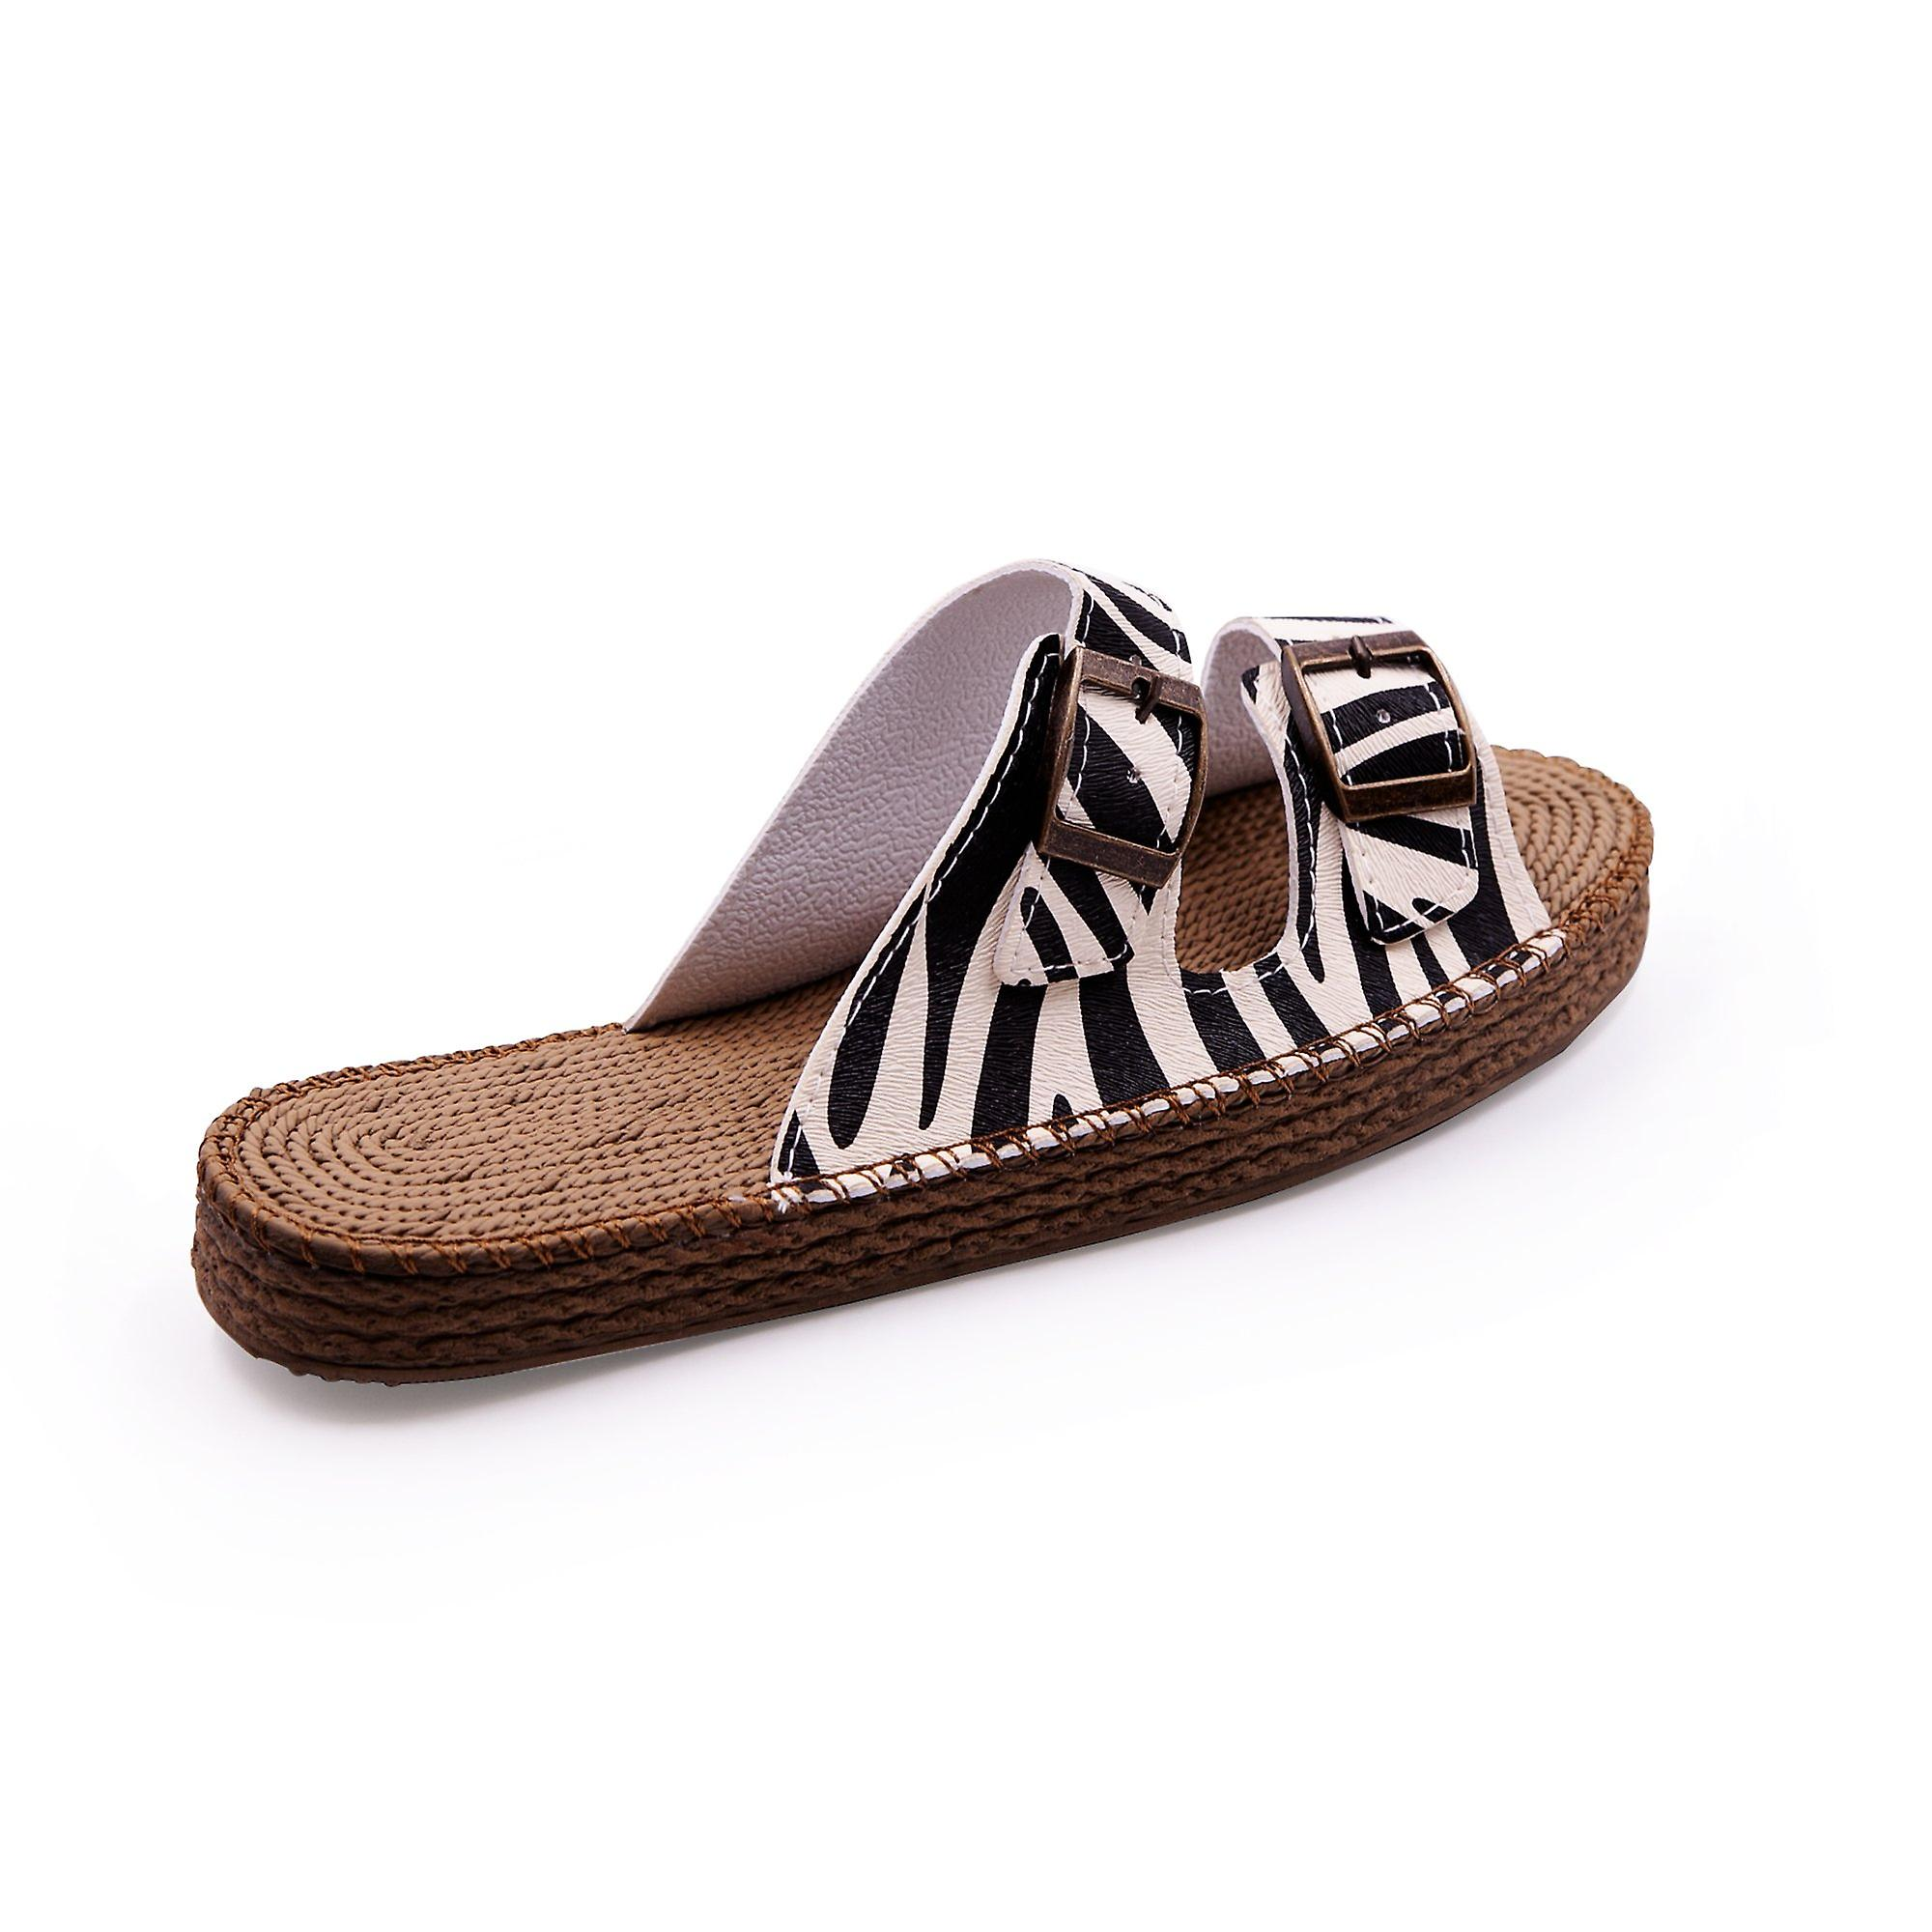 Sunday morning zebra sandals